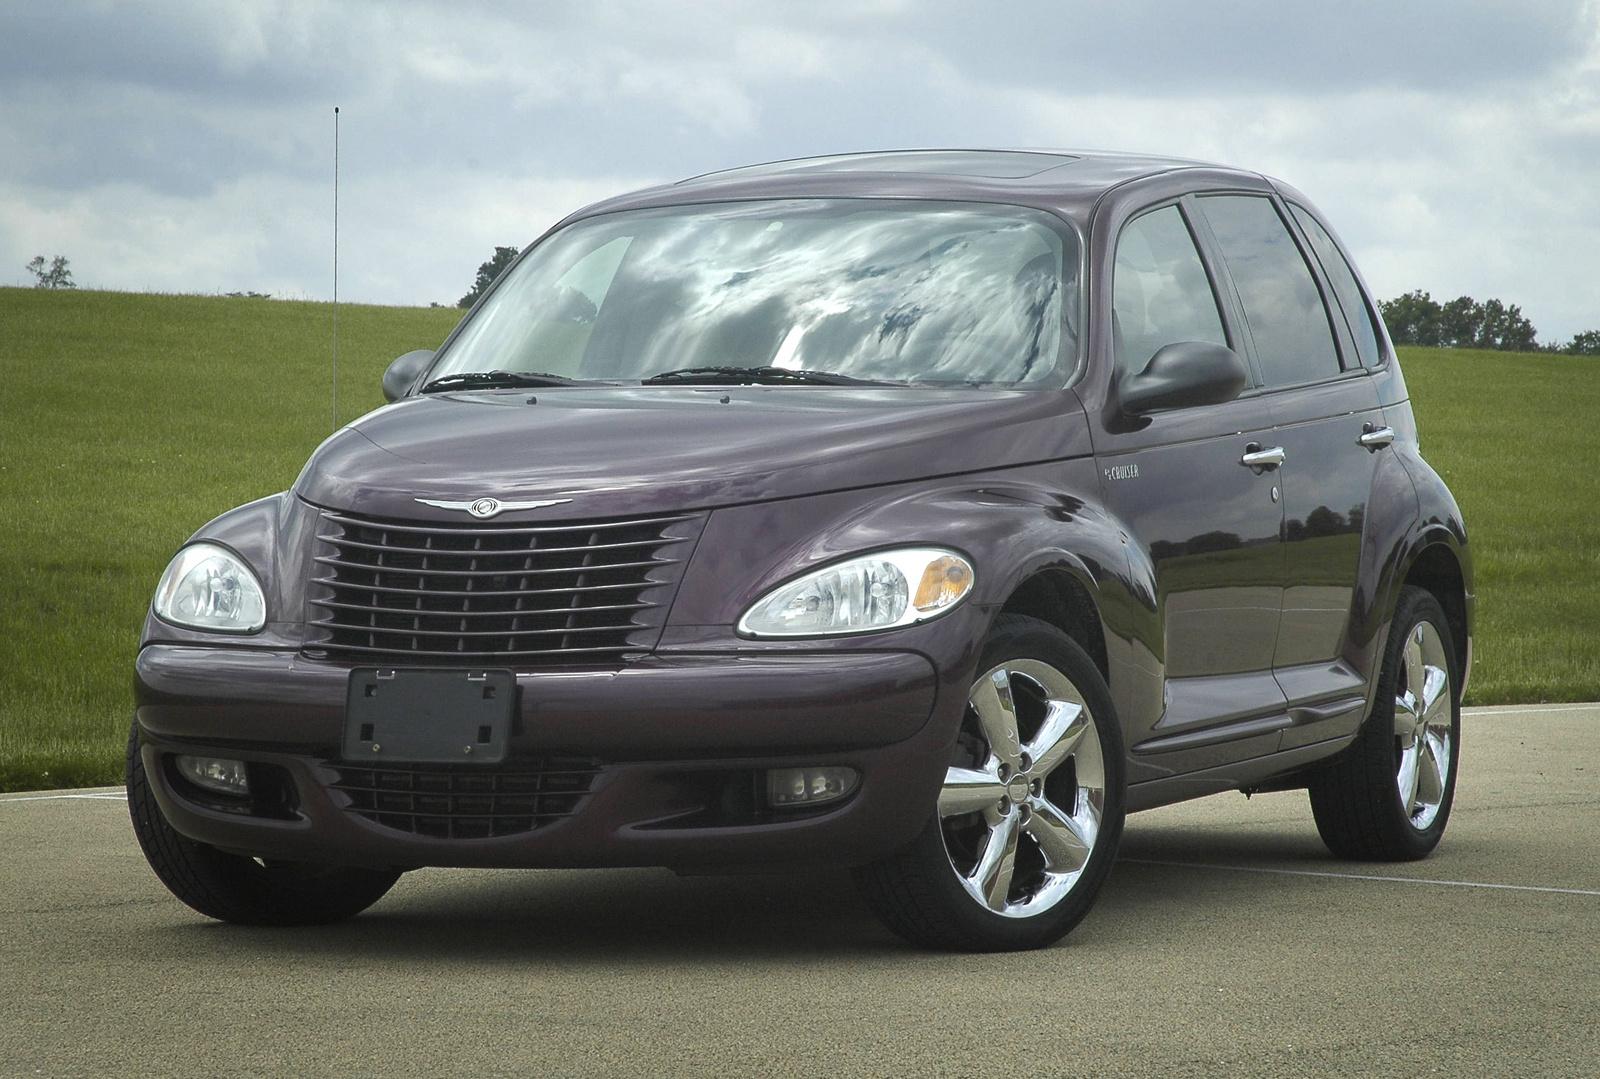 2003 Chrysler Pt Cruiser - Pictures